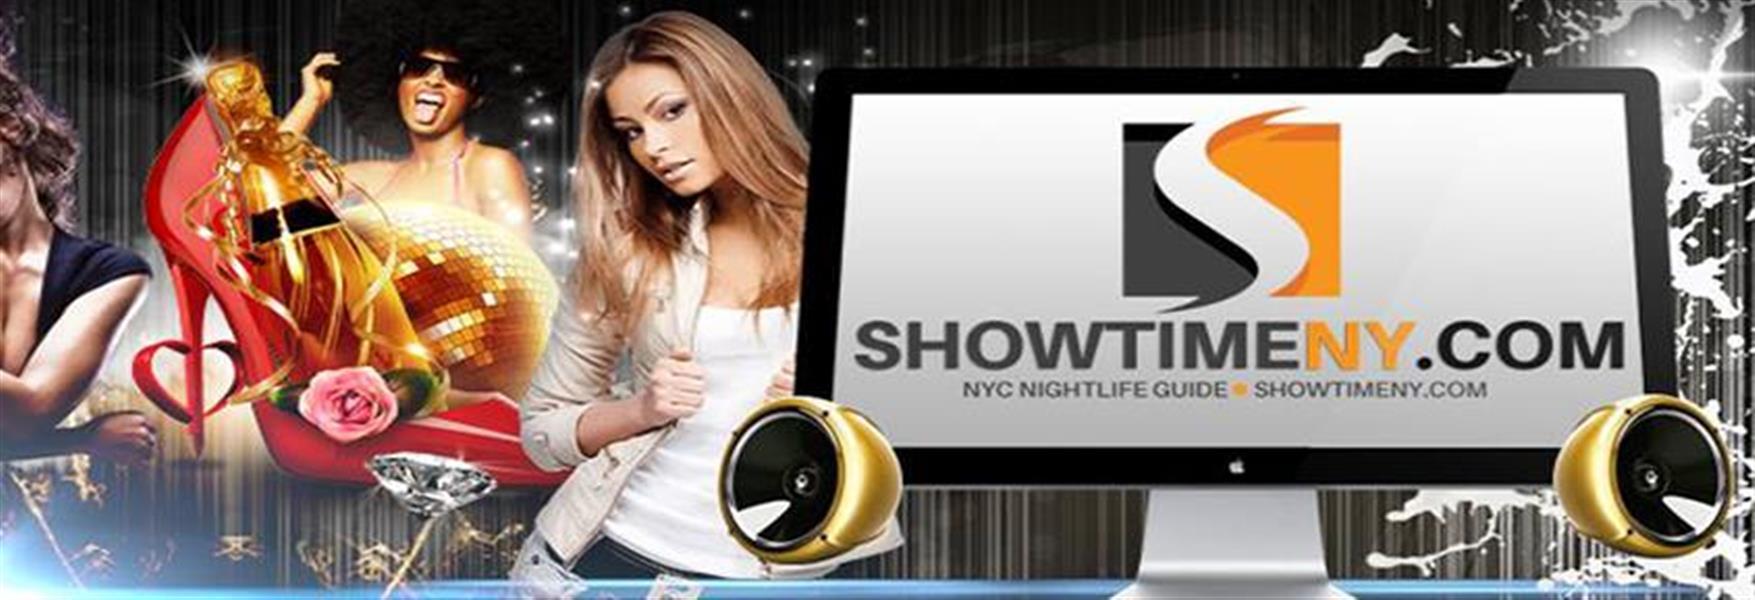 f541c1d8-afcc-4047-8acf-59bcad2f9b6d_showtime banner long.jpg